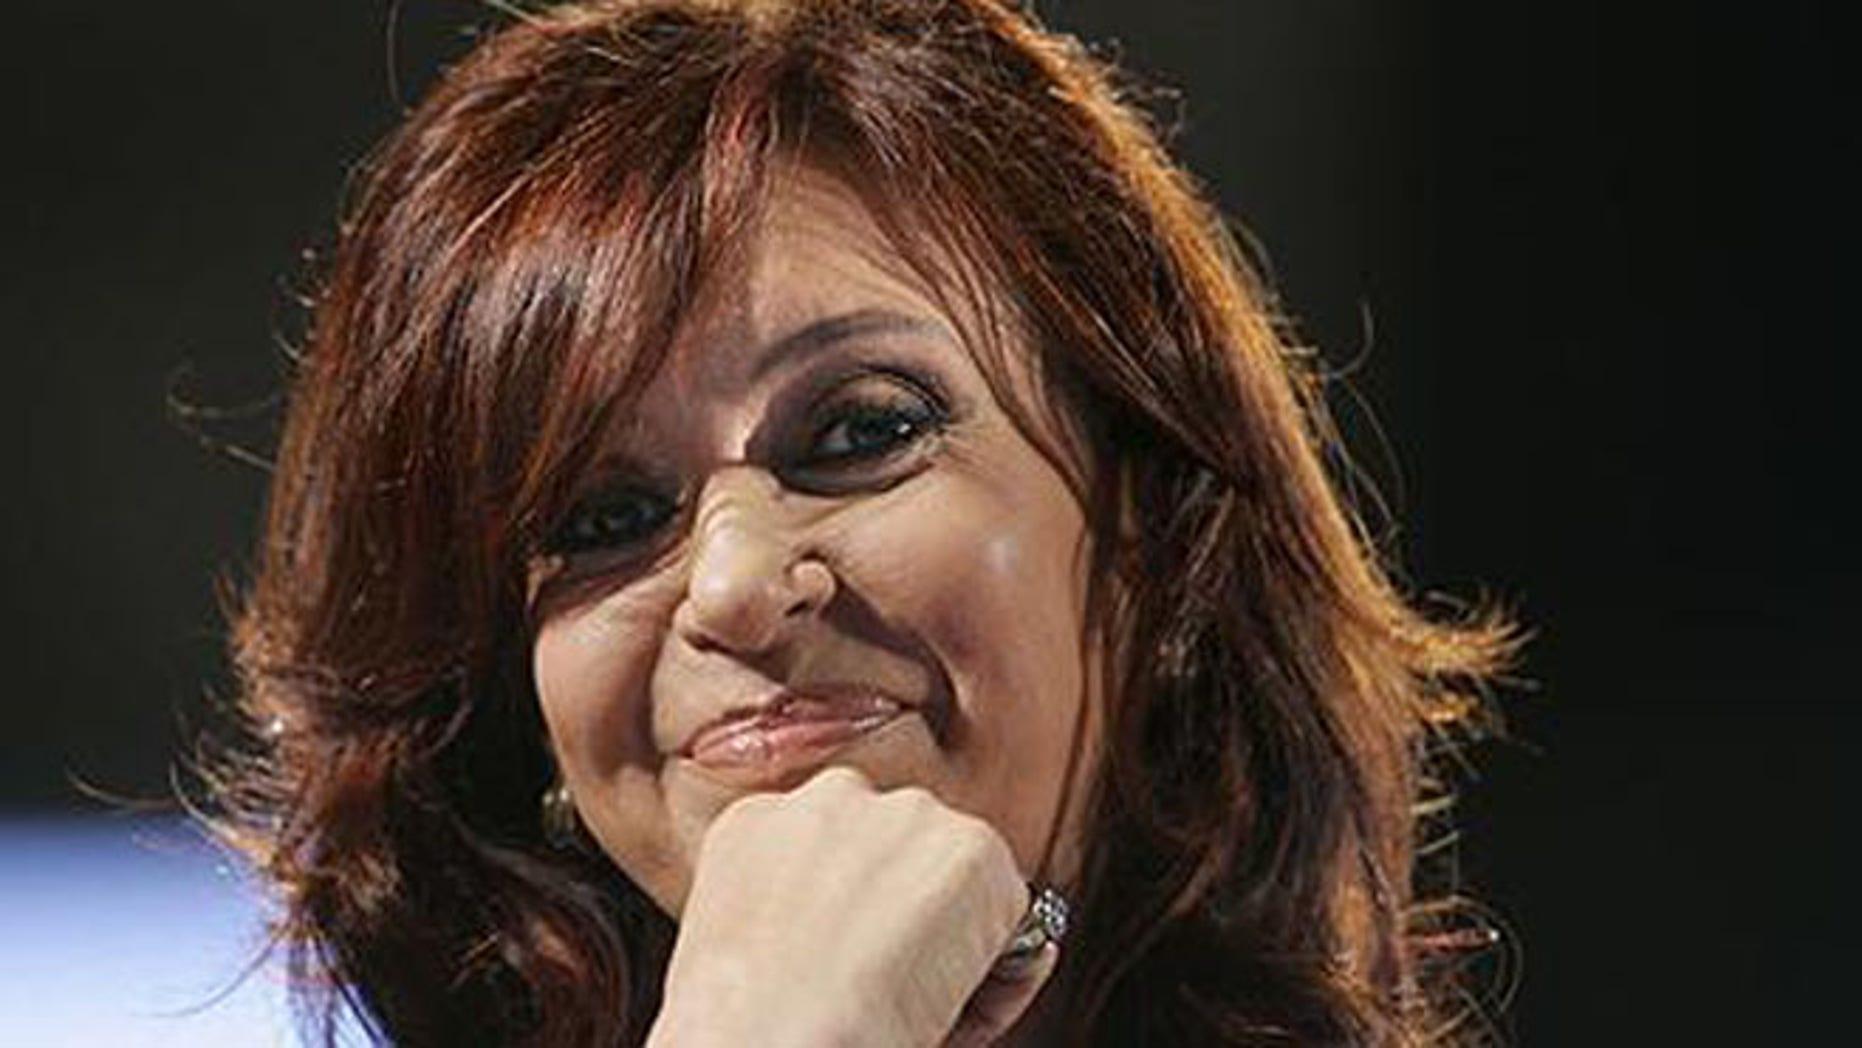 File Photo: Argentine President Cristina Fernandez de Kirchner, Friday, Oct. 5, 20007. (AP Photo/Natacha Pisarenko)